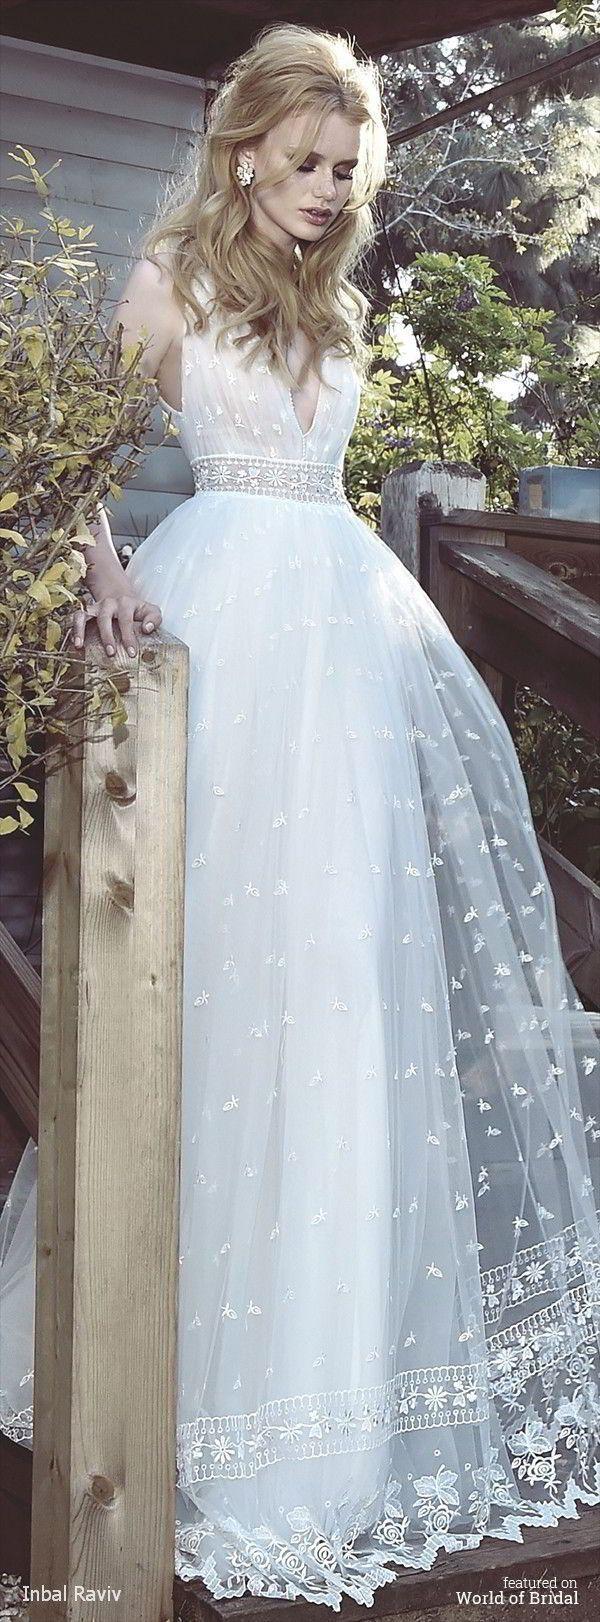 Inbal Raviv 2016 Wedding Dresses